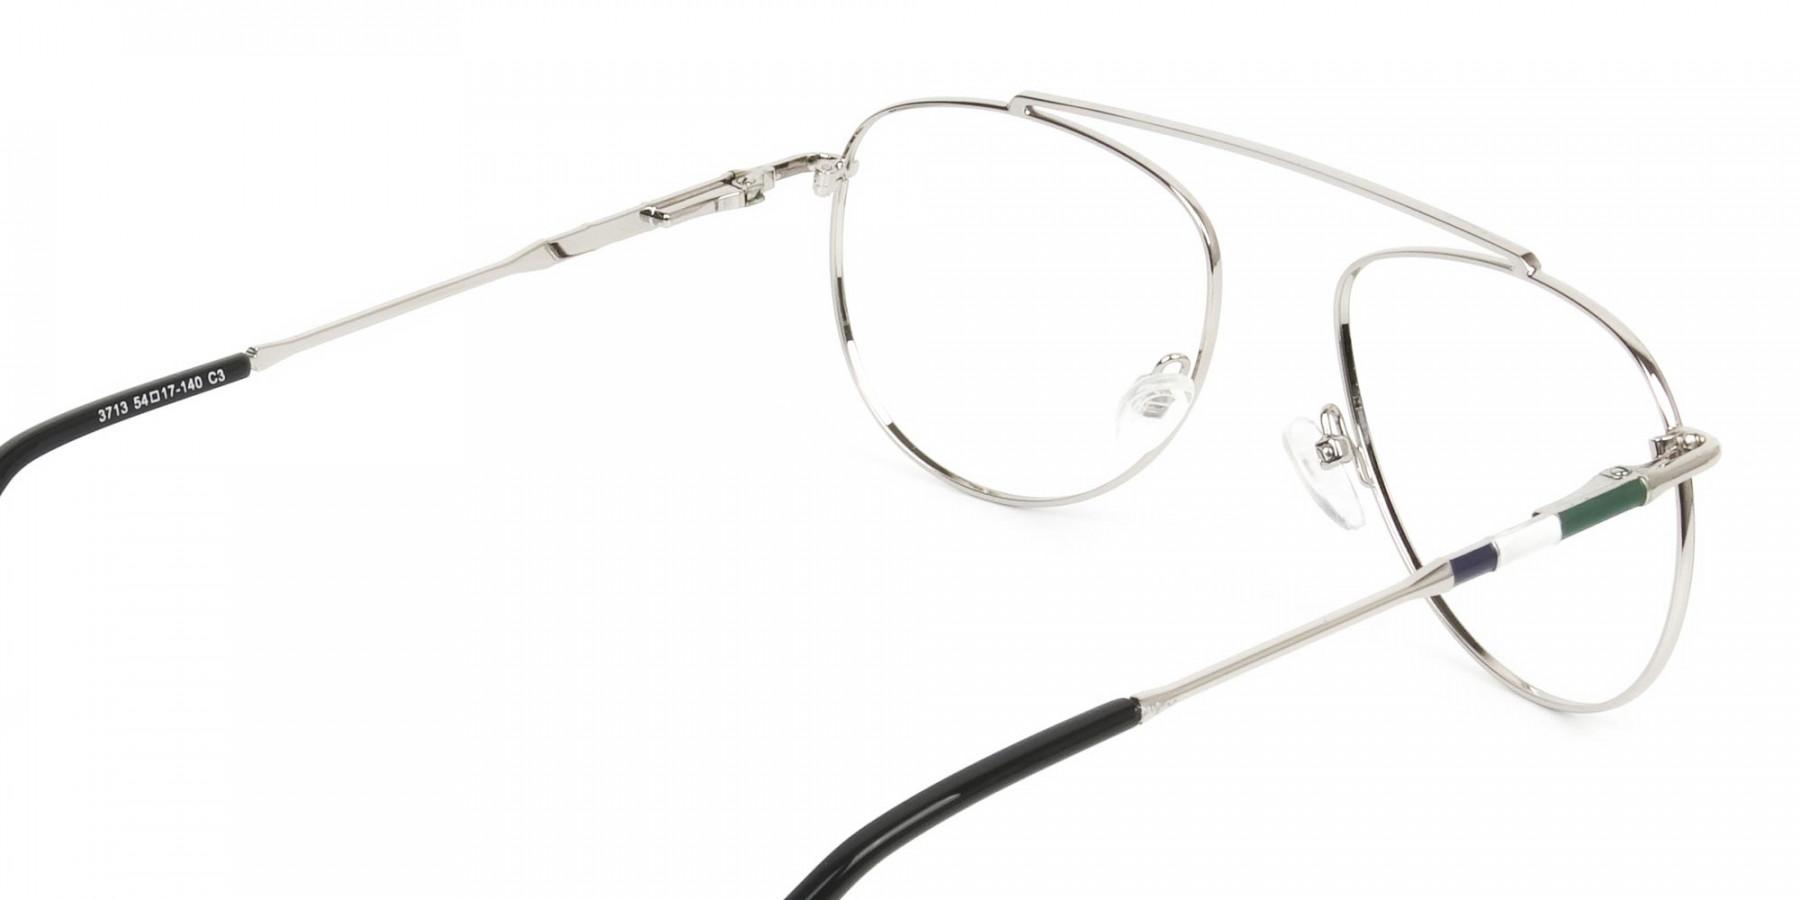 Silver & Dark Green Aviator Glasses - 1